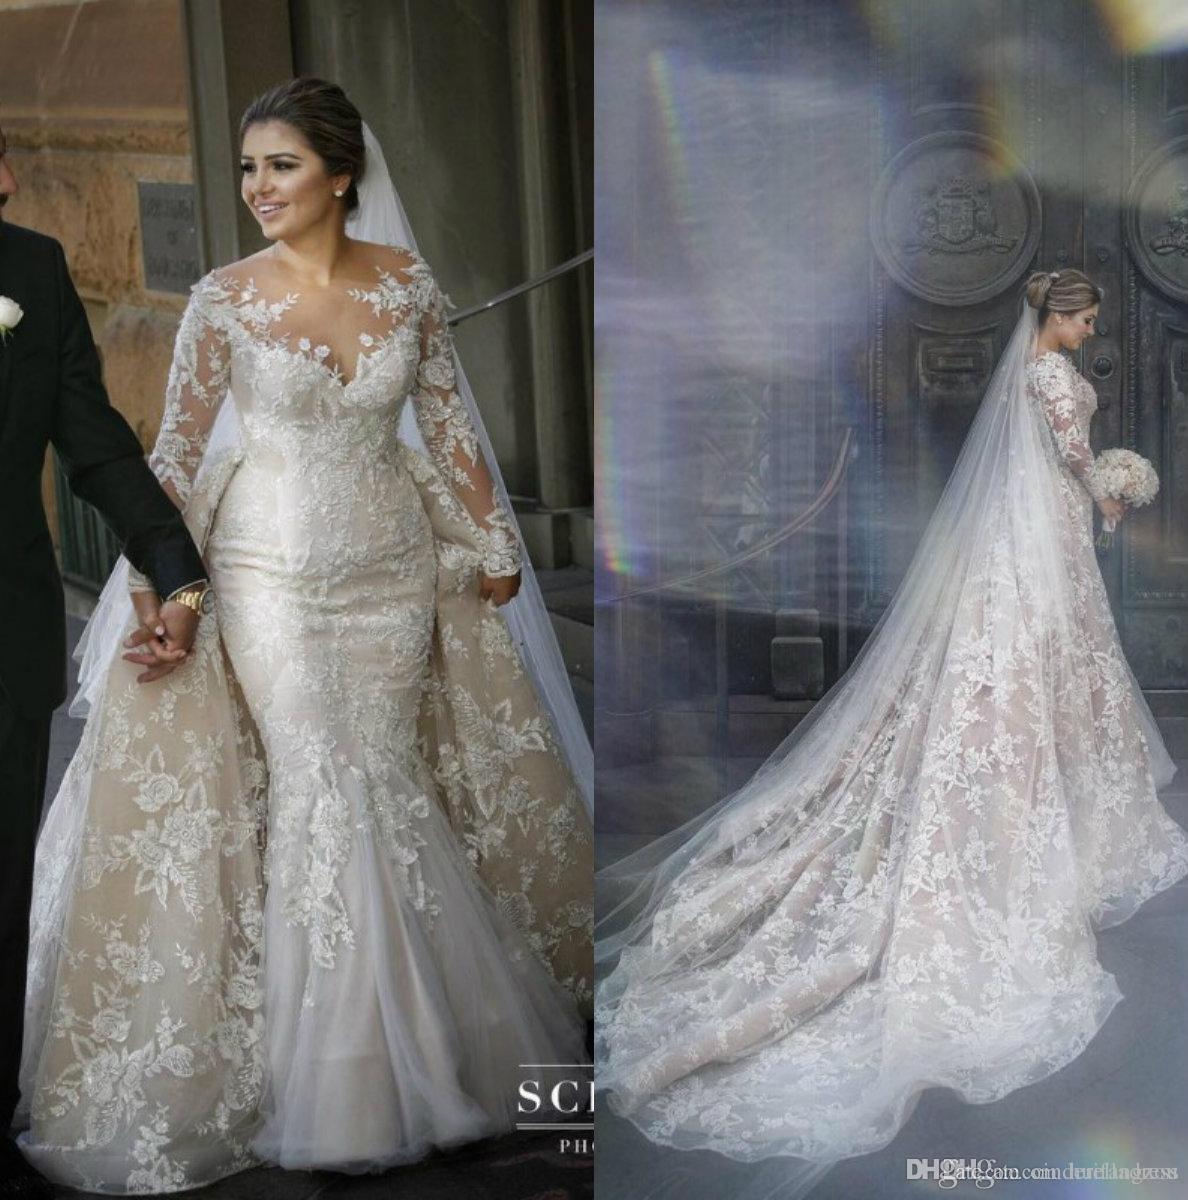 2019 Vintage Mermaid Wedding Dresses With Detachable Train Arabic Sheer Neck Lace Appliques Plus Size Wedding Dress Long Sleeve Bridal Gowns